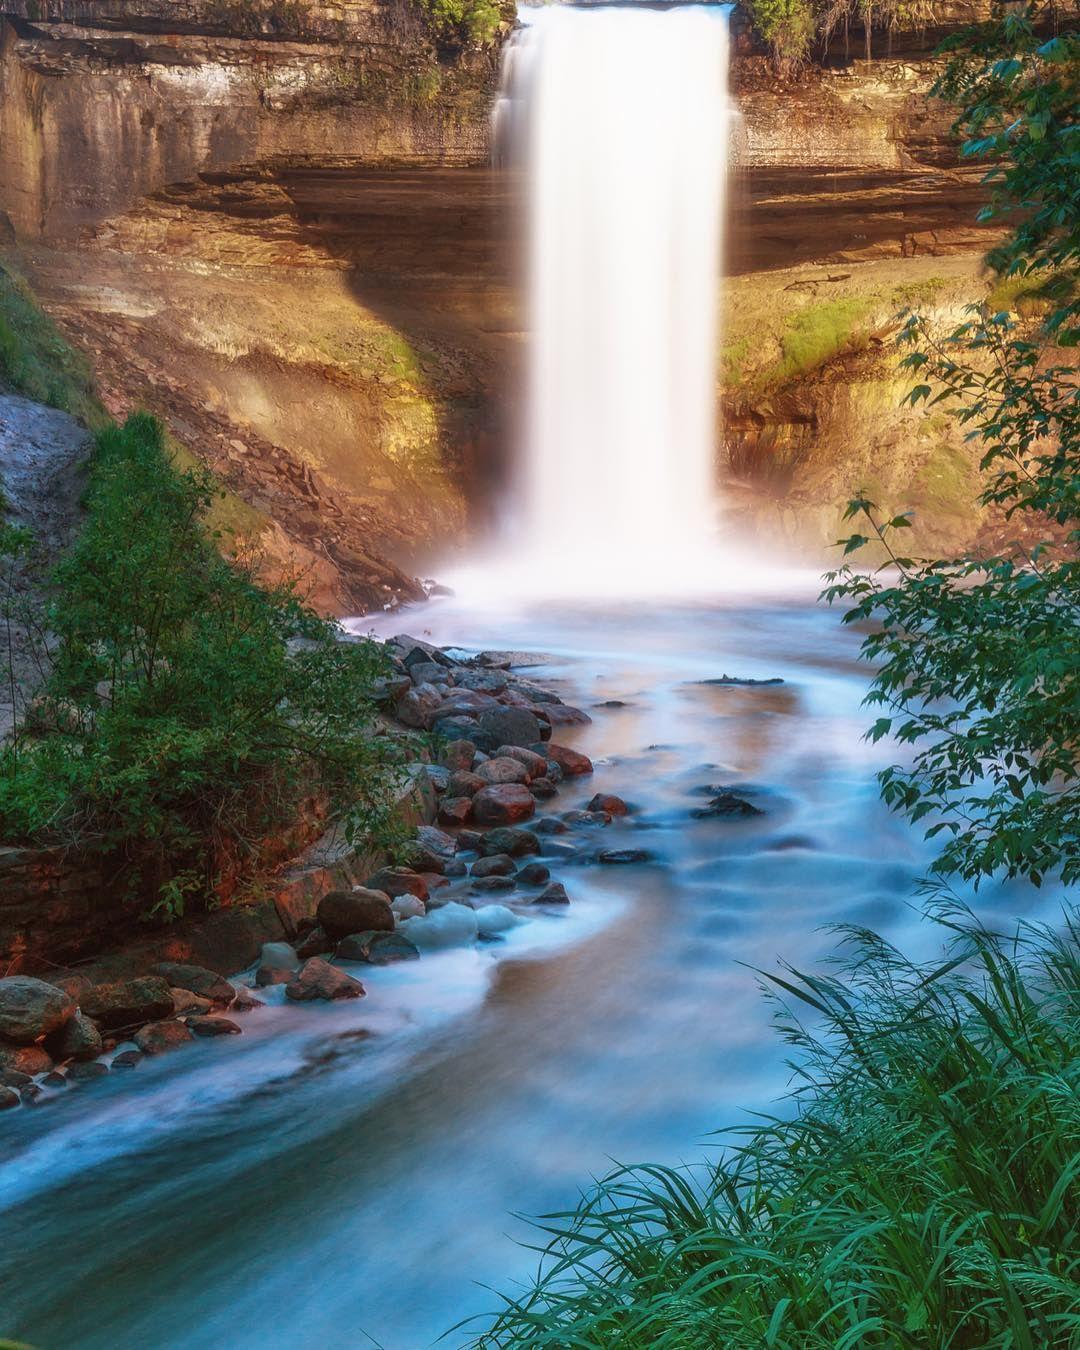 Minnehaha Falls at sunset yesterday. Makes up for the bugs. #minnesota #longexposure #minnehahafalls #minneapolis #onlyinmn #captureminnesota #captureminneapolis #waterfalls #canonphotography #teamcanon #canon_photos by mfayephotography